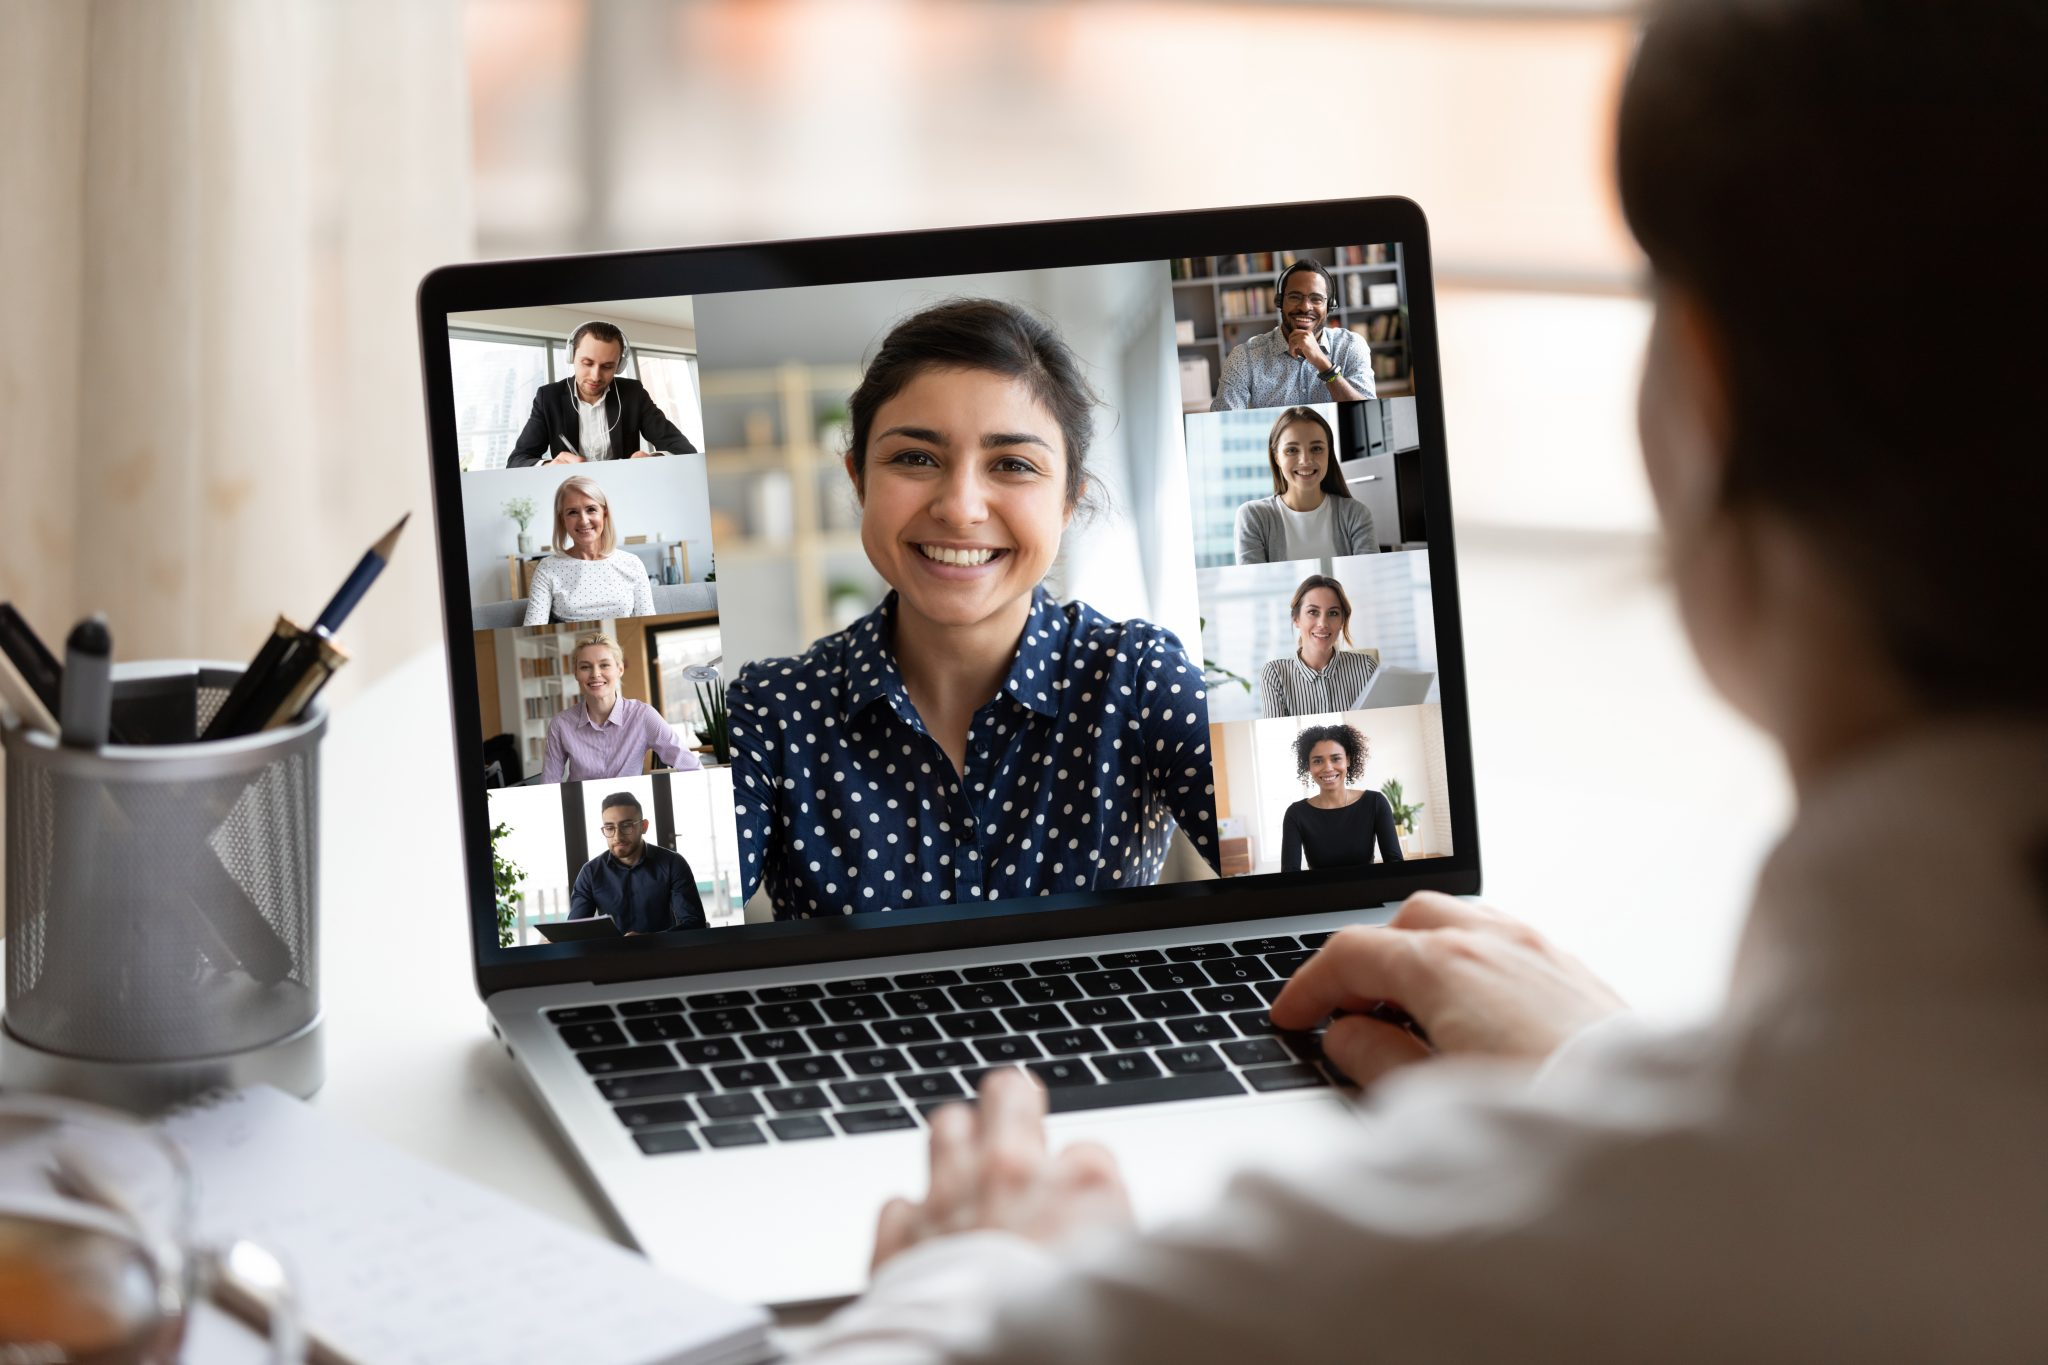 Top Virtual Conferences for Agencies in 2020